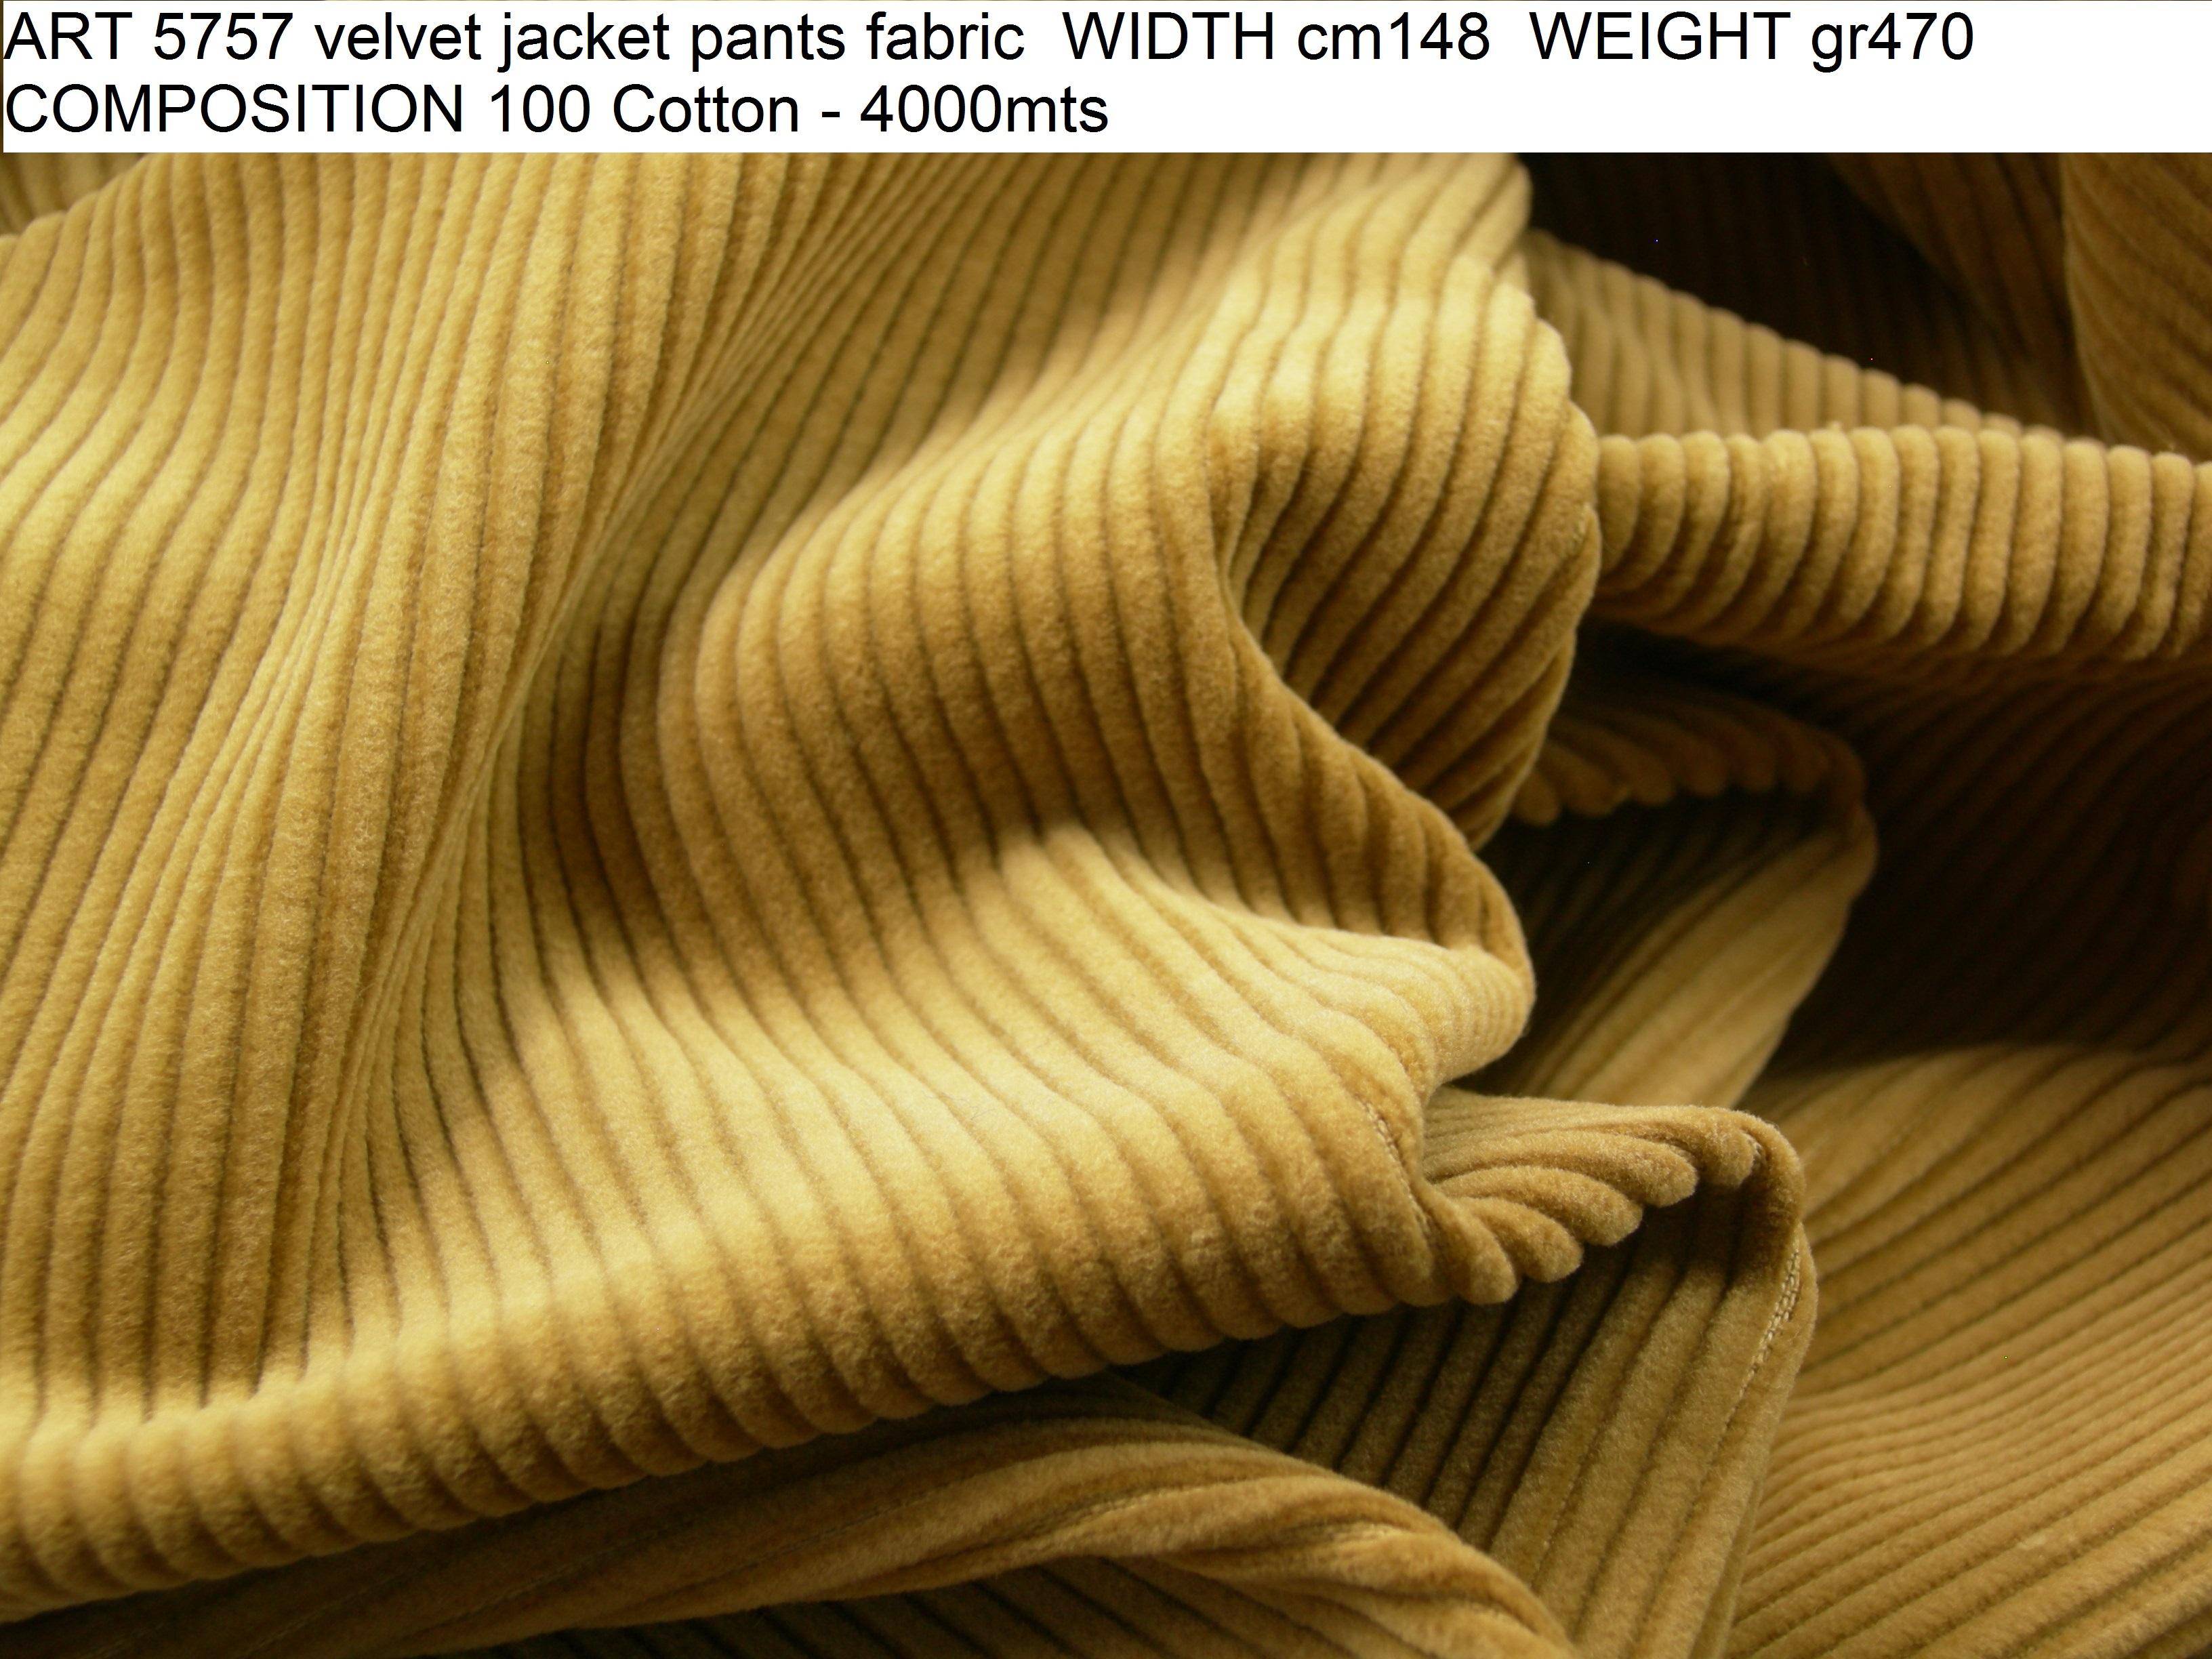 ART 5757 velvet jacket pants fabric WIDTH cm148 WEIGHT gr470 COMPOSITION 100 Cotton - 4000mts